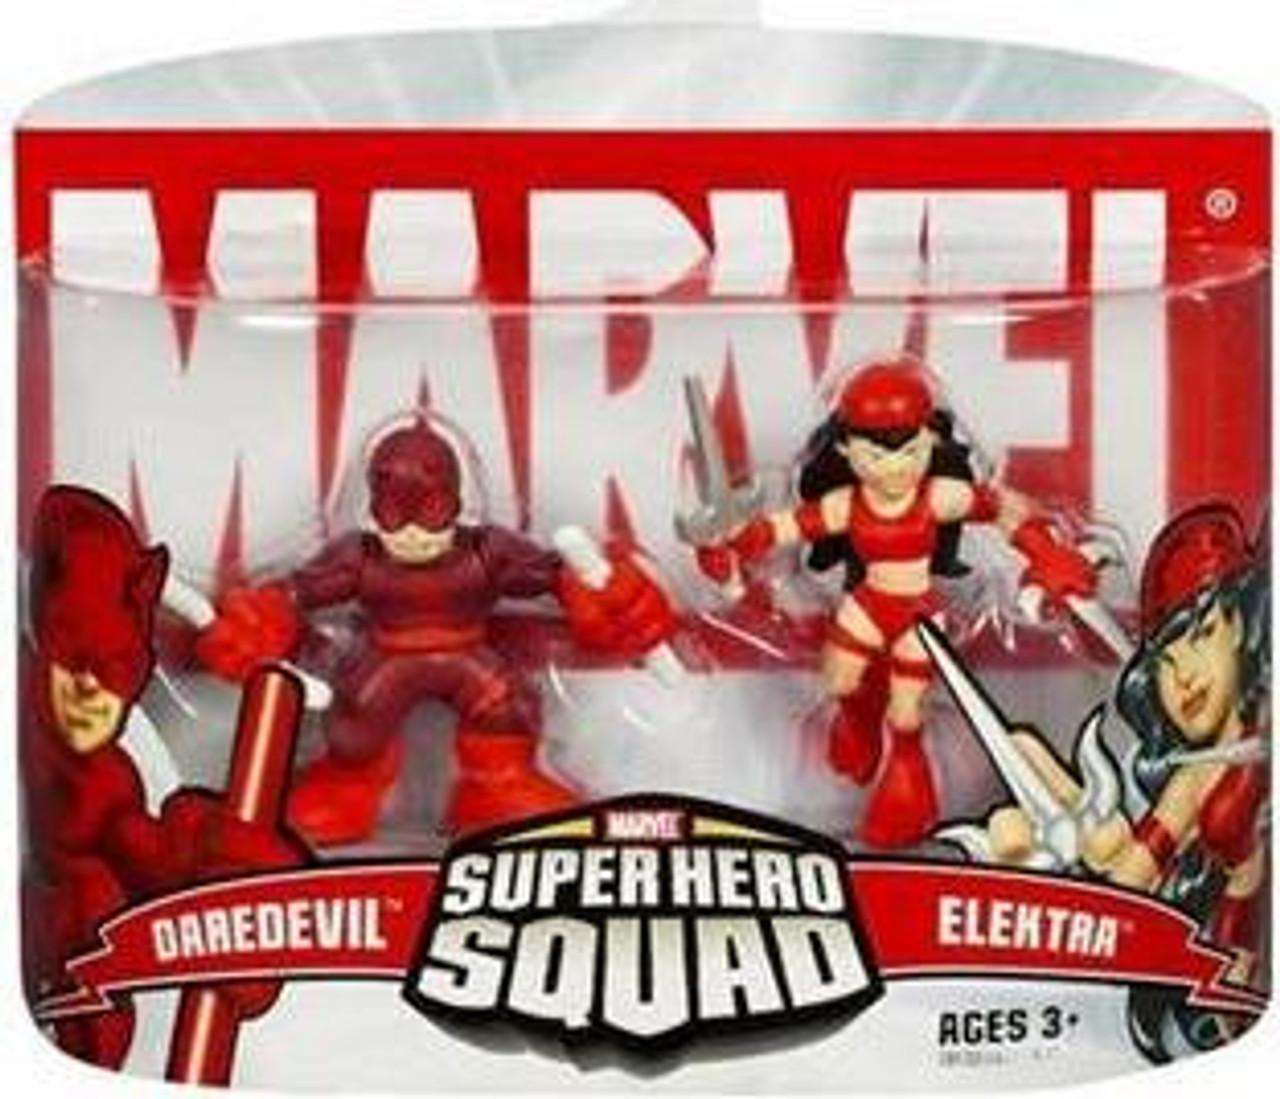 Marvel Super Hero Squad Series 2 Daredevil & Elektra Action Figure 2-Pack